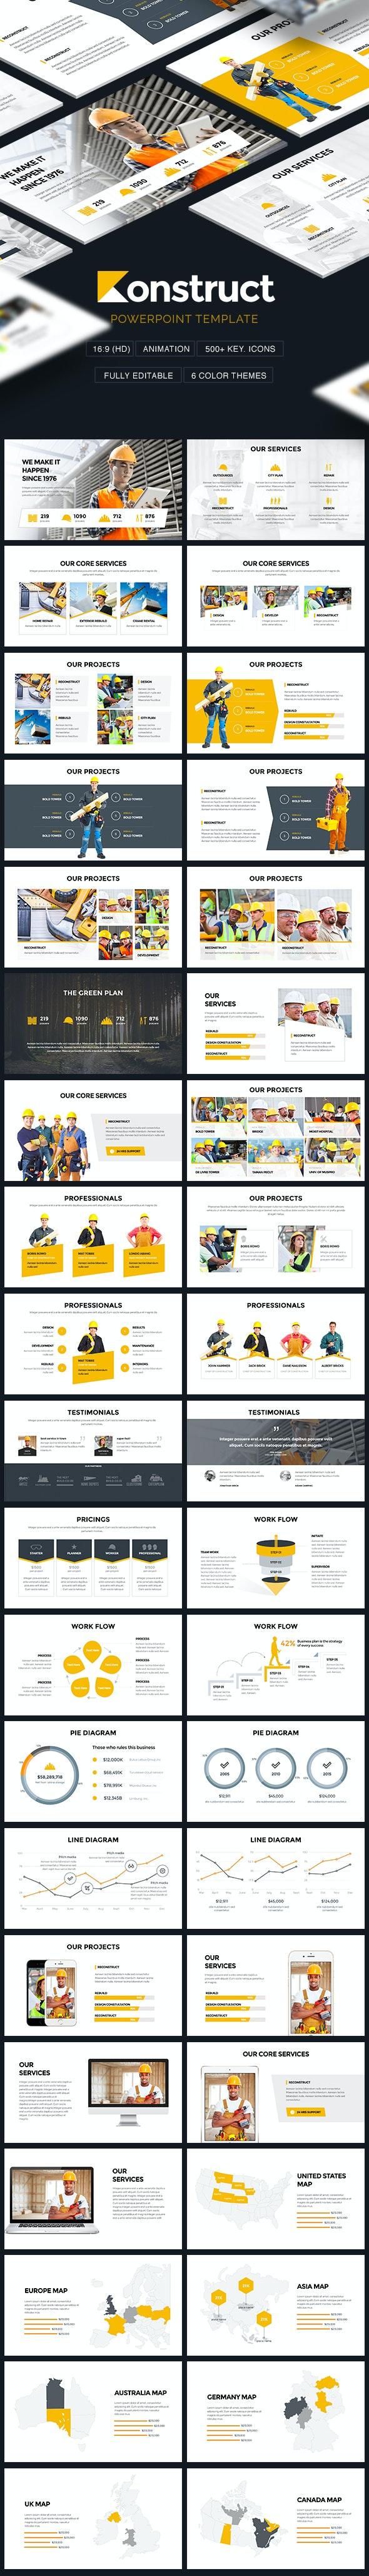 Konstruct - Construction Theme Powerpoint Template - PowerPoint Templates Presentation Templates